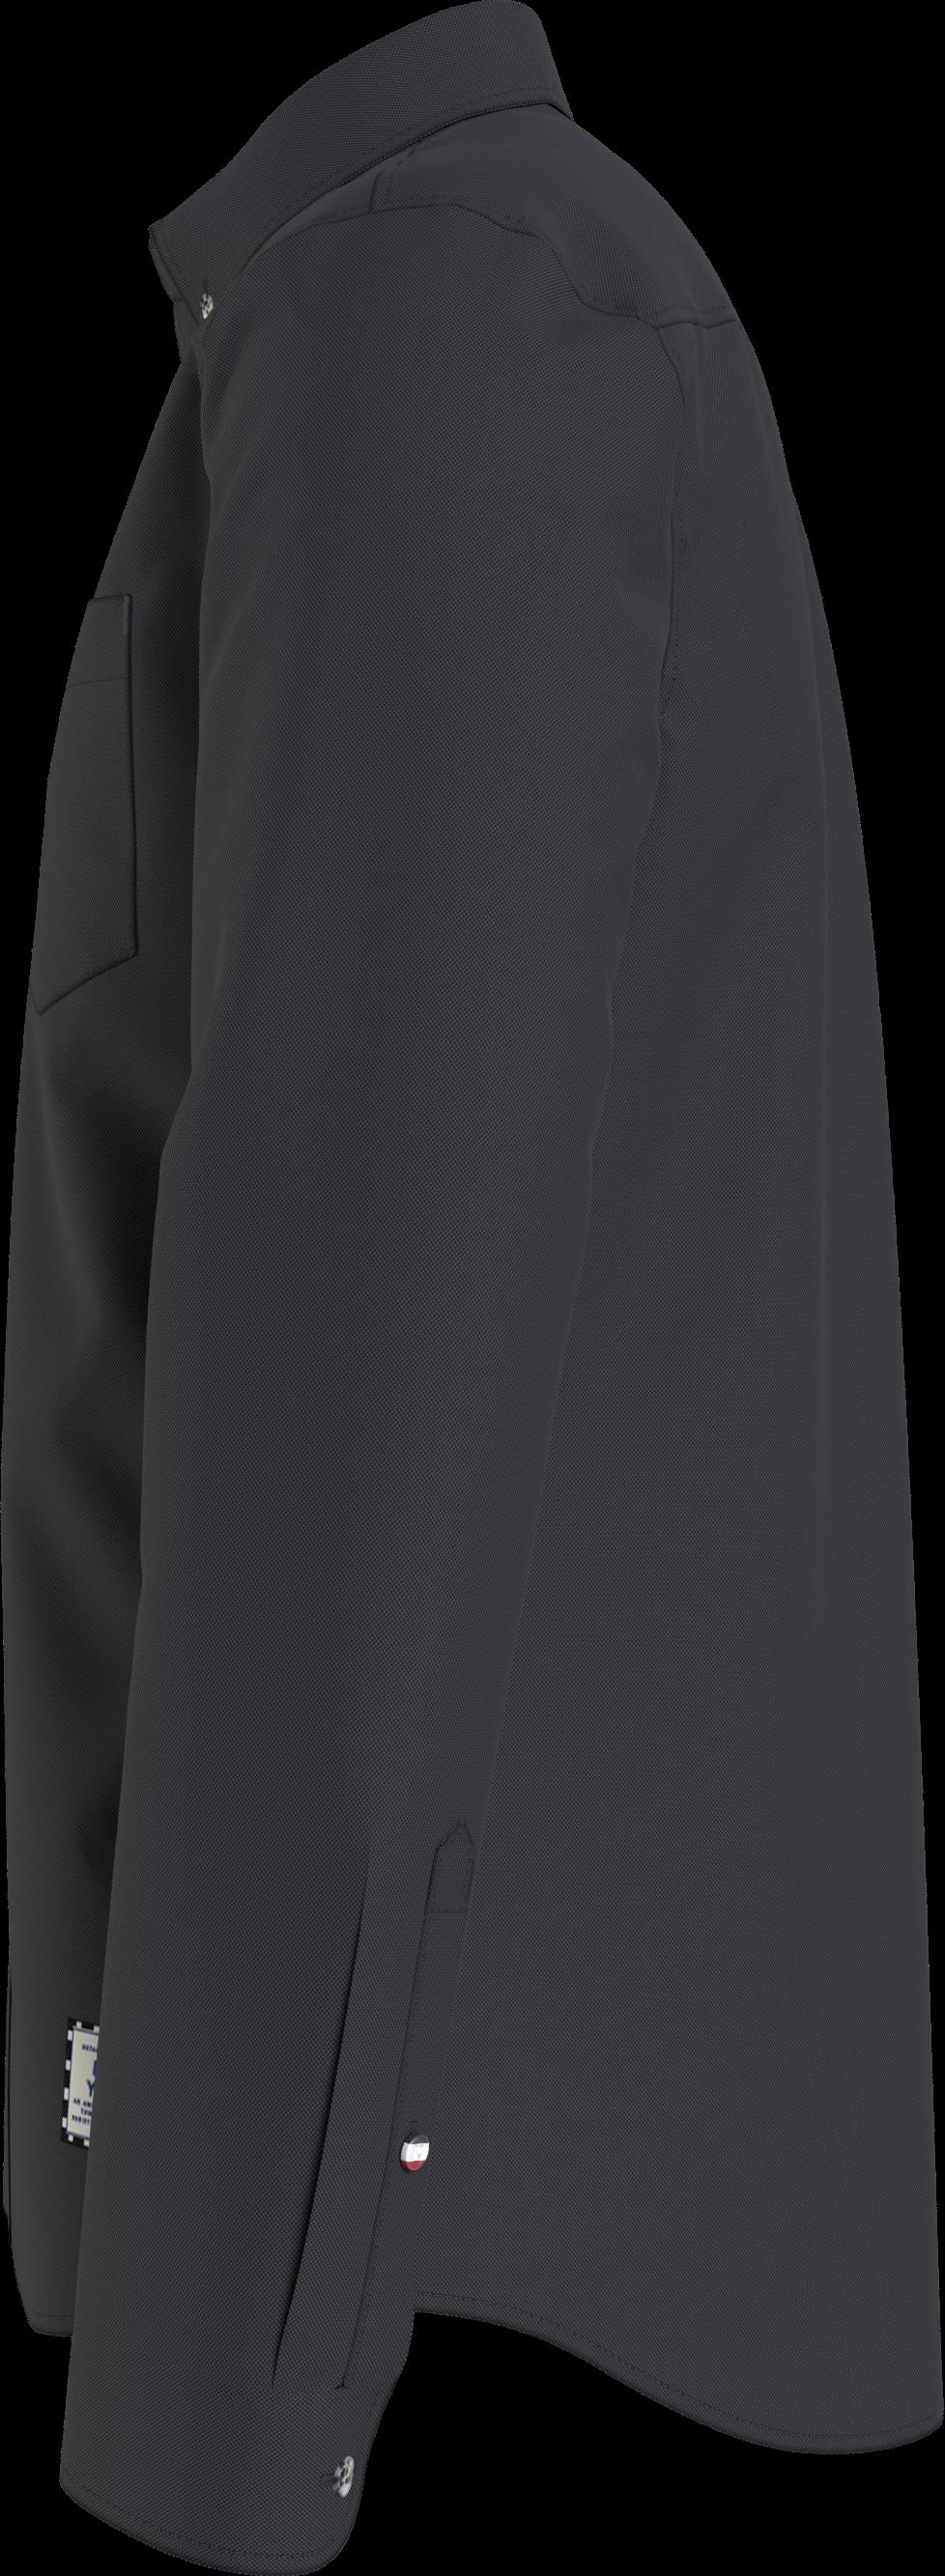 Hilfiger Denim Two-Tone Oxford Skjorte, Sort, S